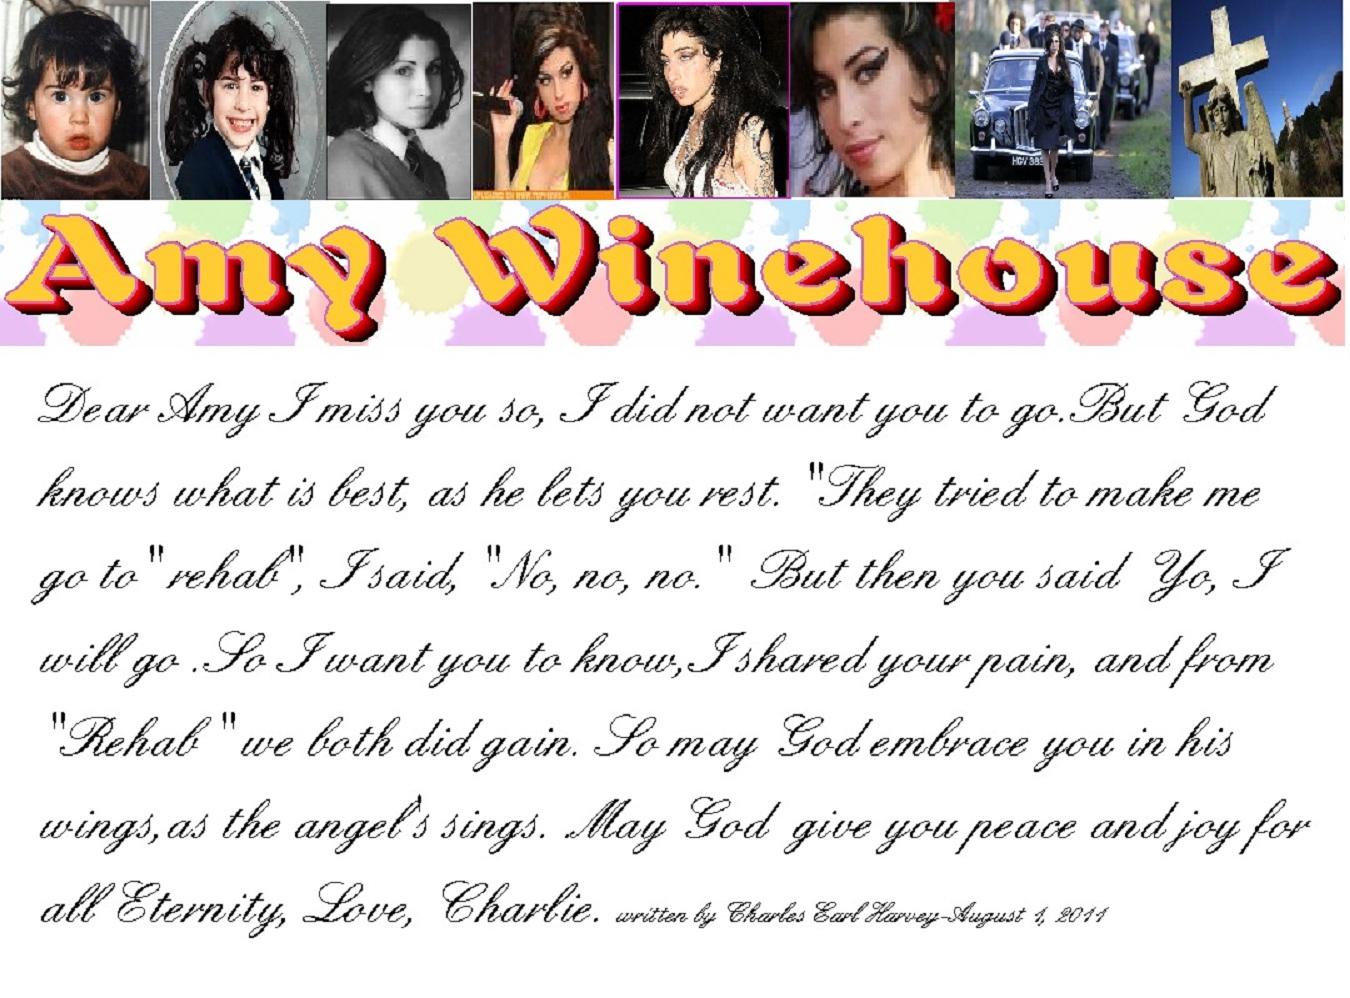 http://1.bp.blogspot.com/-u5peMjEPyRU/Tjbi5j9jckI/AAAAAAAAAYk/ErFosYxp8ls/s1600/Dear+amy+Large.jpg